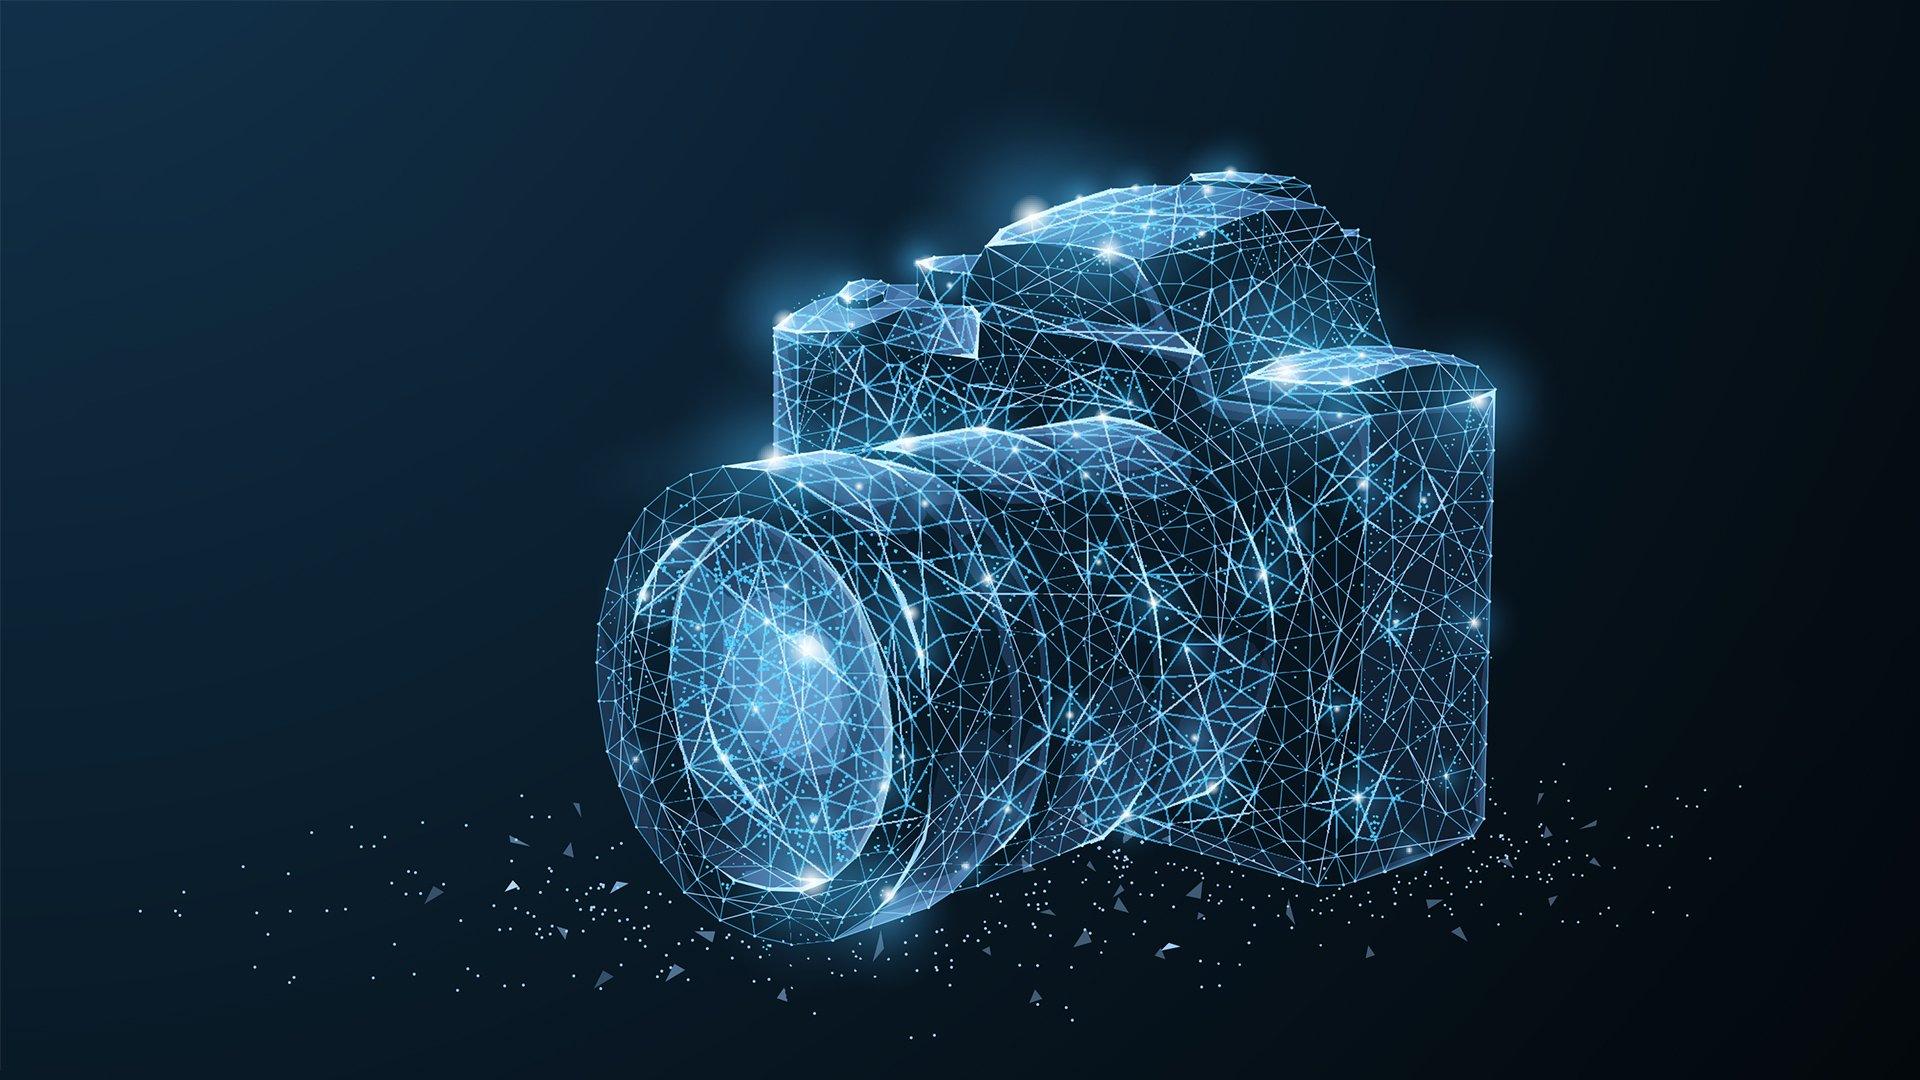 Software upgradable image sensors